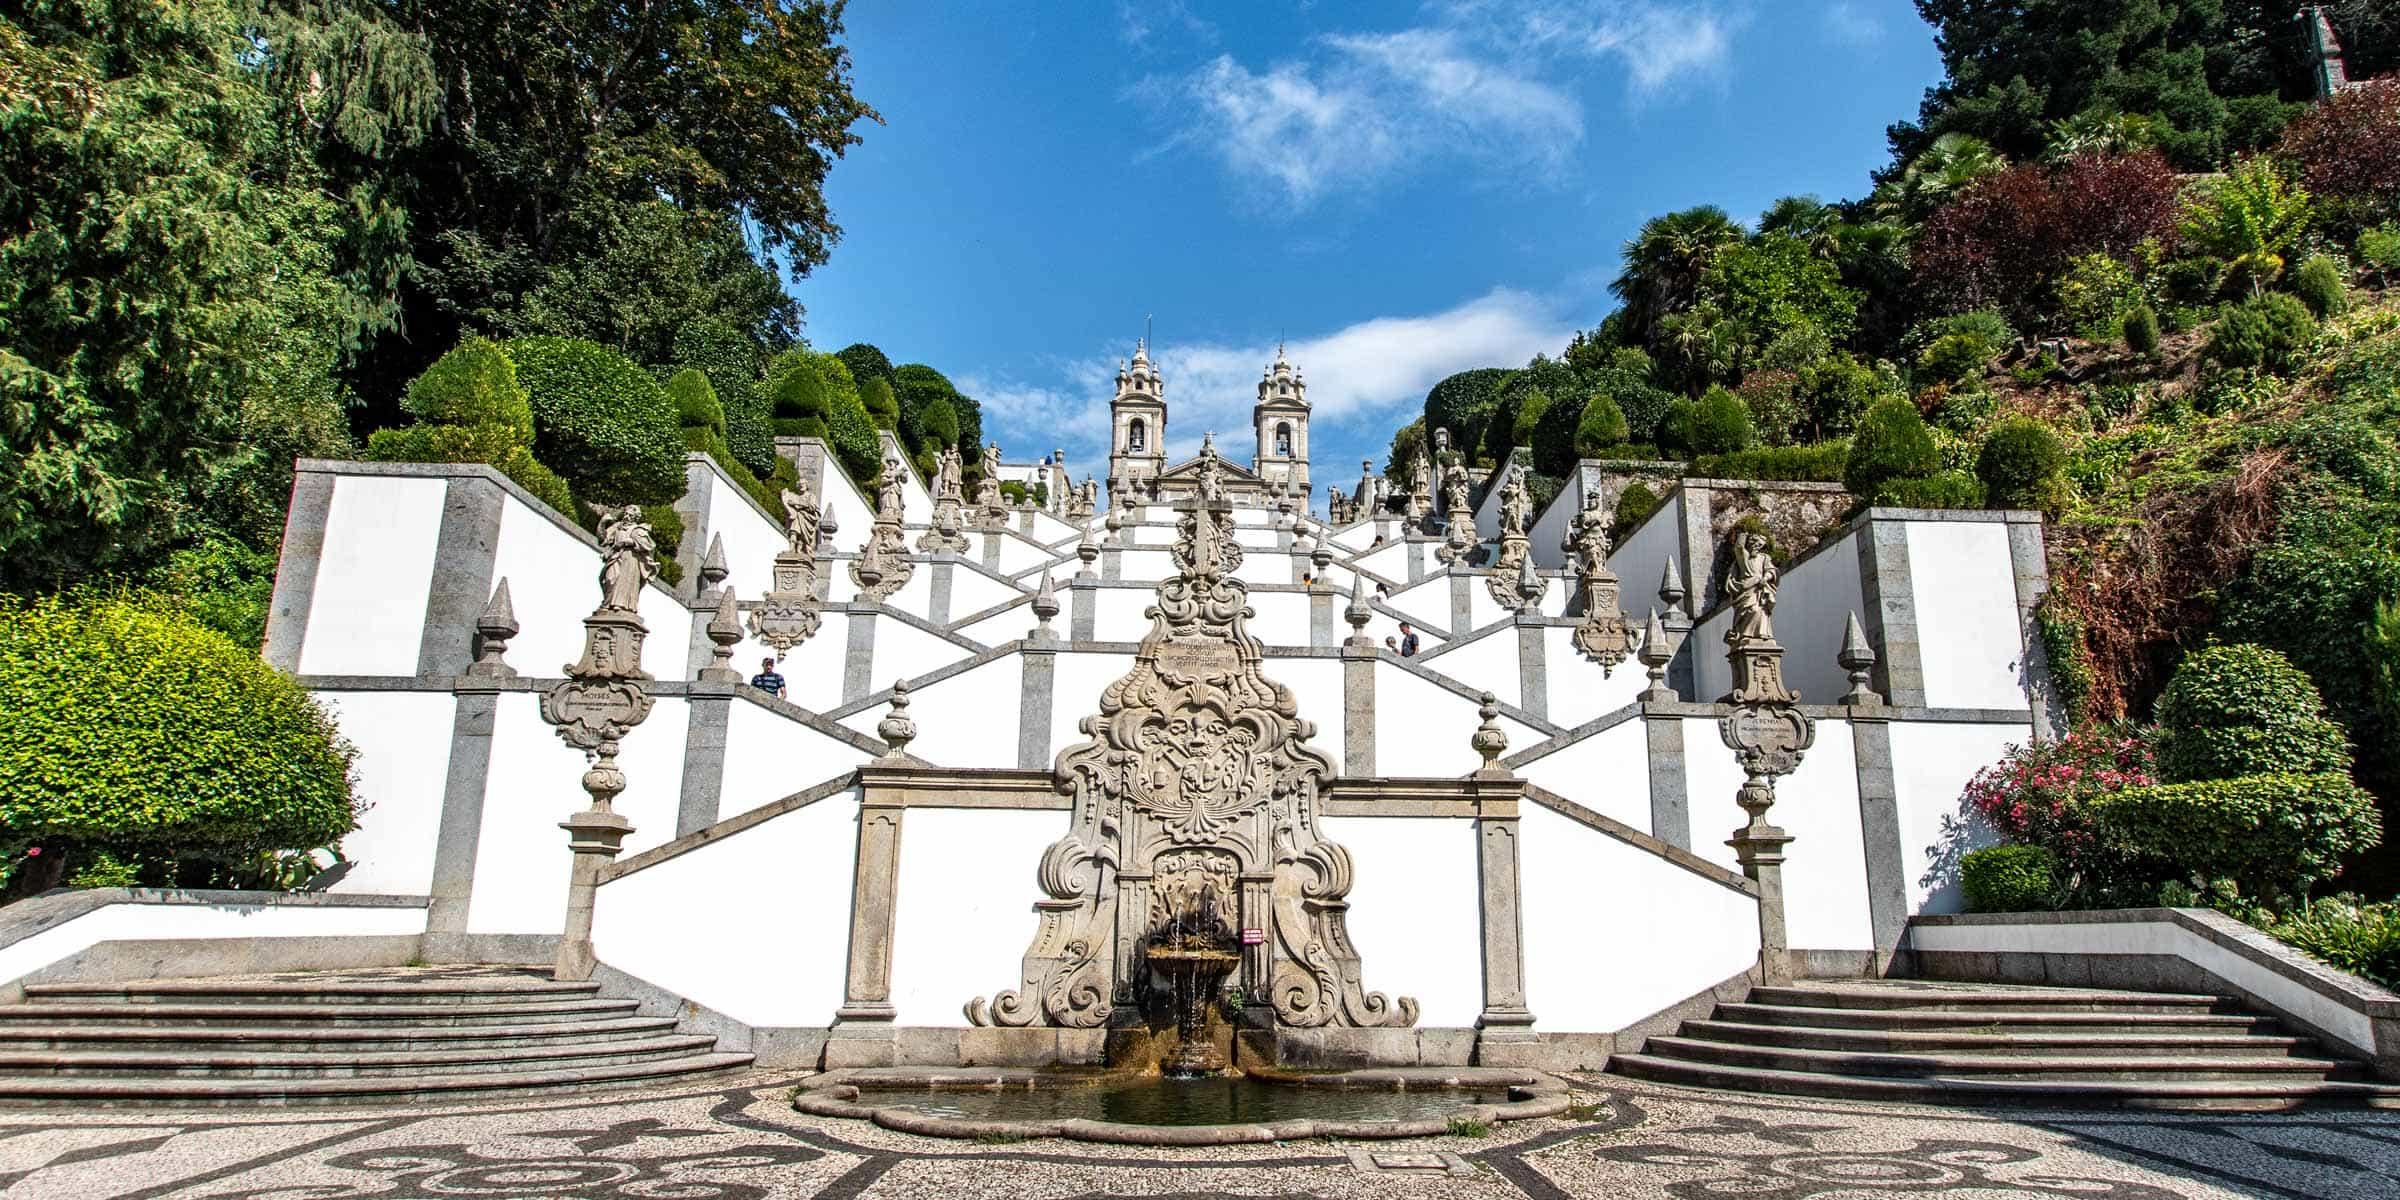 Porto - Braga Day Trip - Bom Jesus do Monte